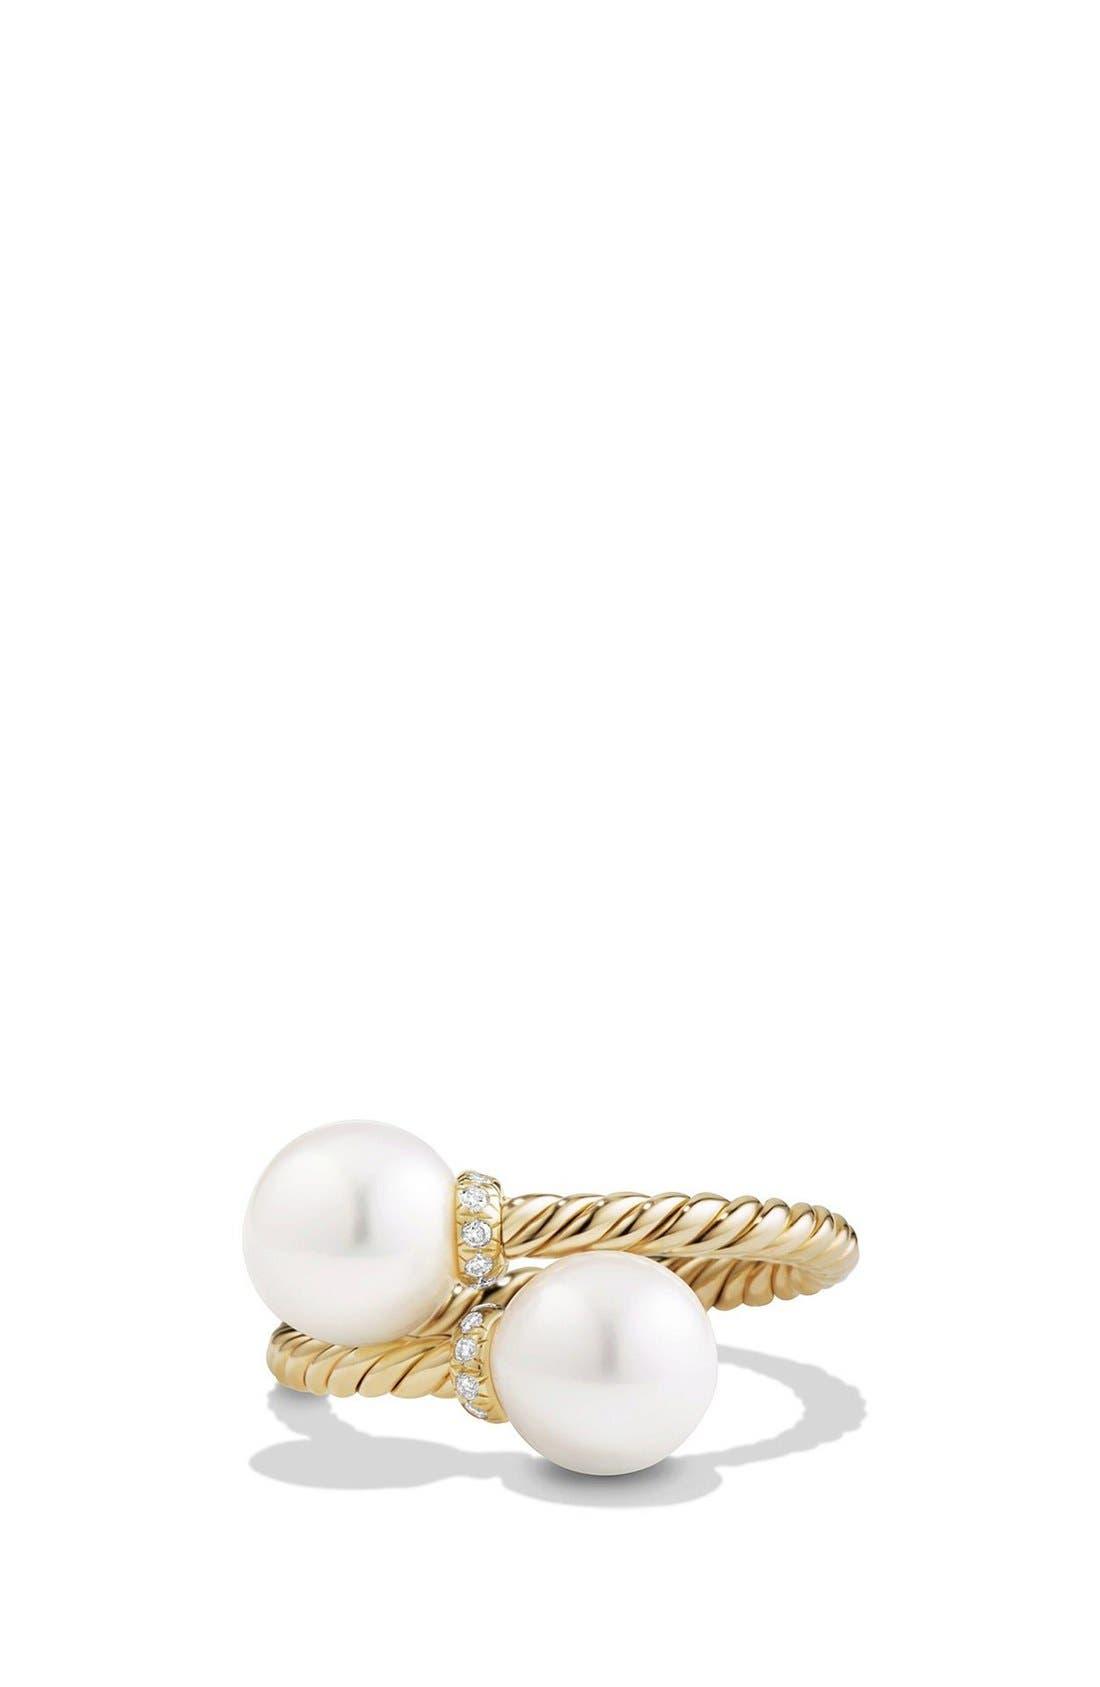 DAVID YURMAN 'Solari' Bead Ring with Diamonds and